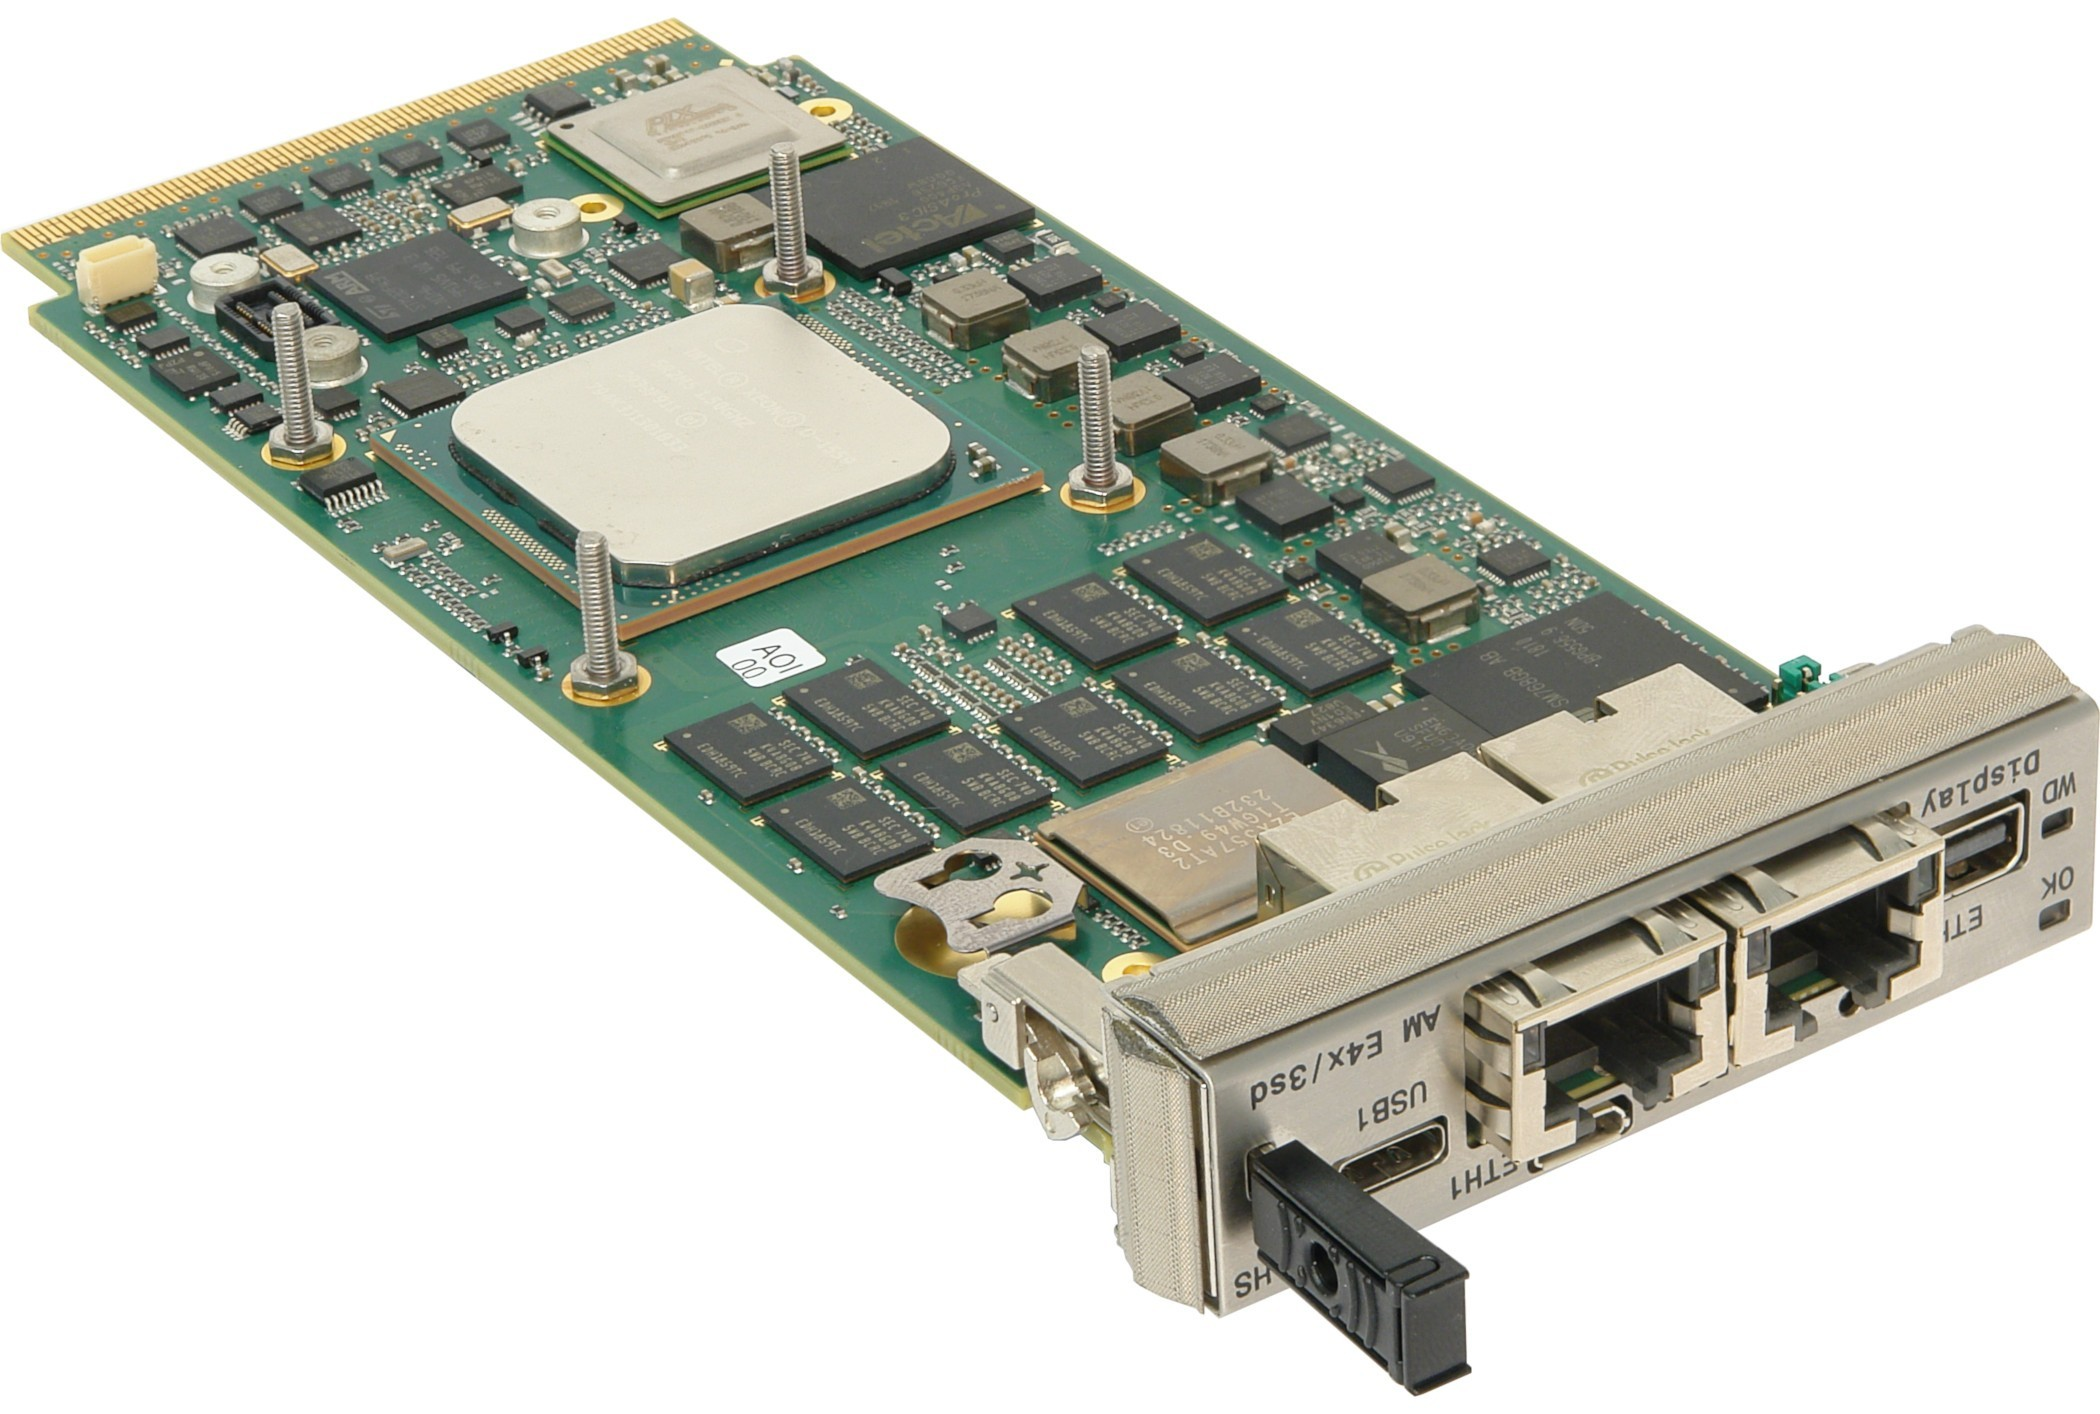 <h4>AM E4x/msd AdvancedMC module based on Intel Xeon Processor D-1500<h4>